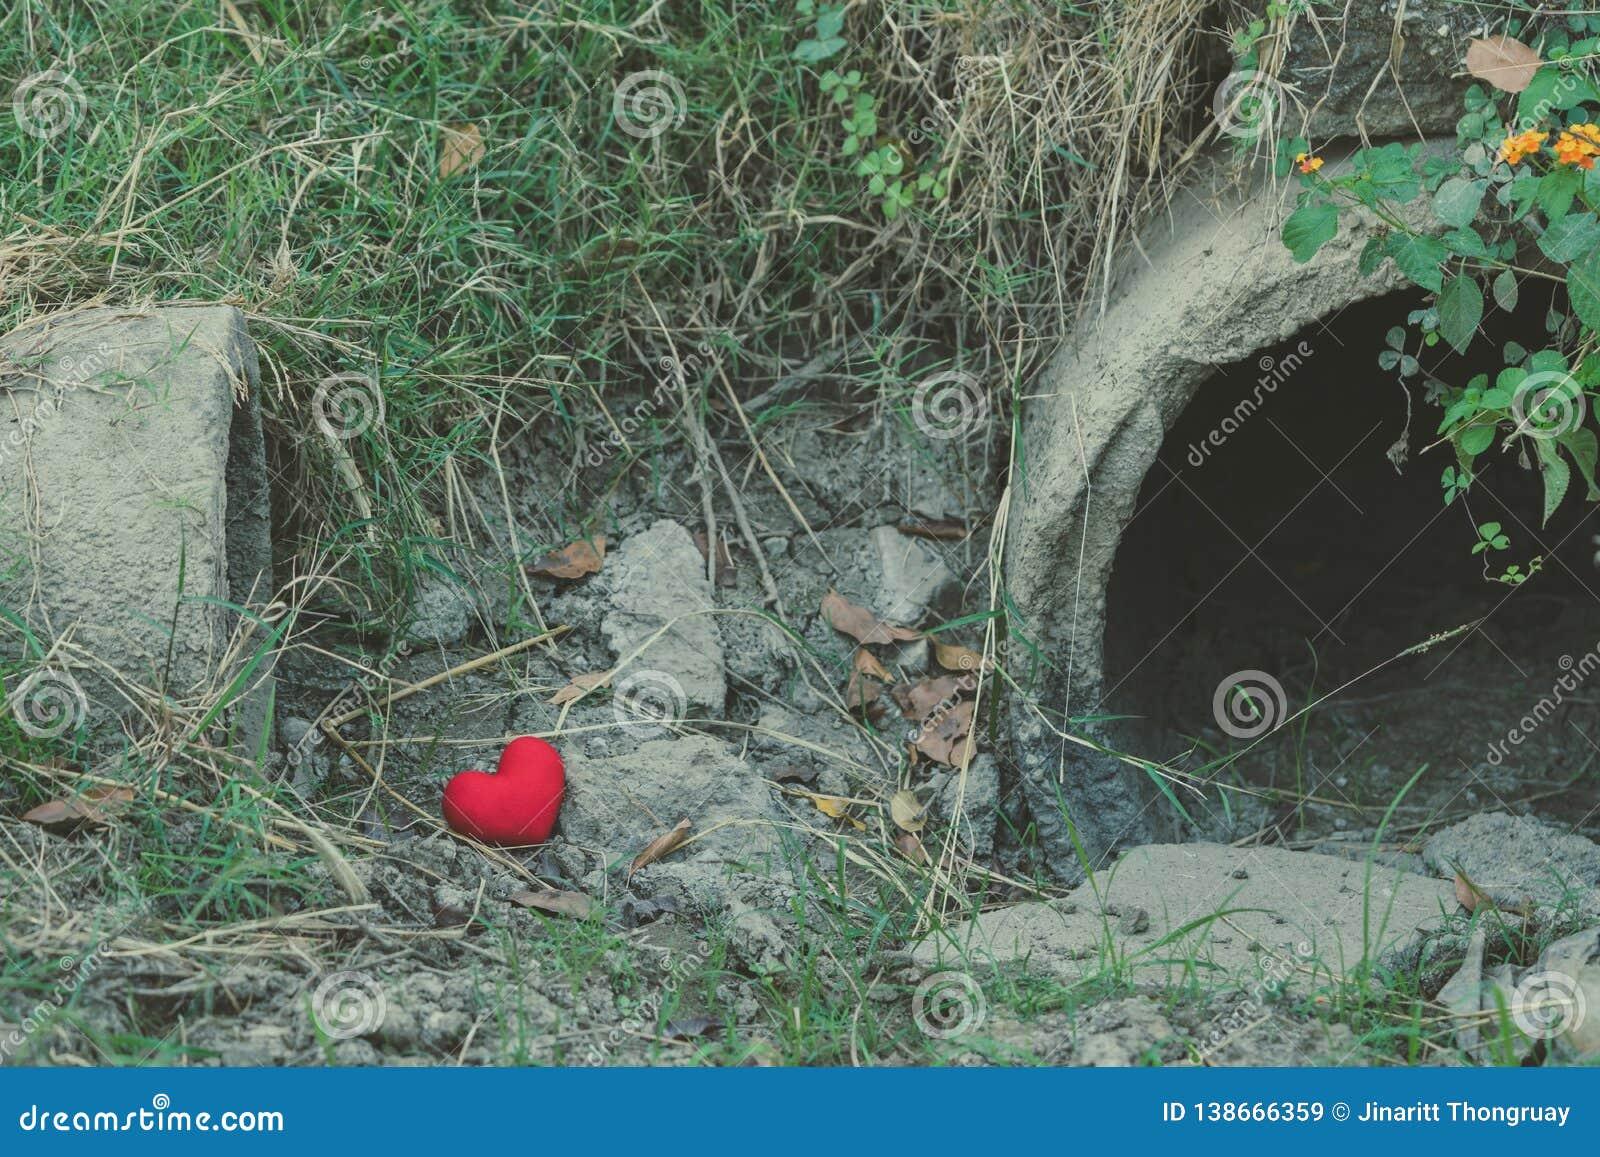 Little red heart pillow falls in the culvert rice field